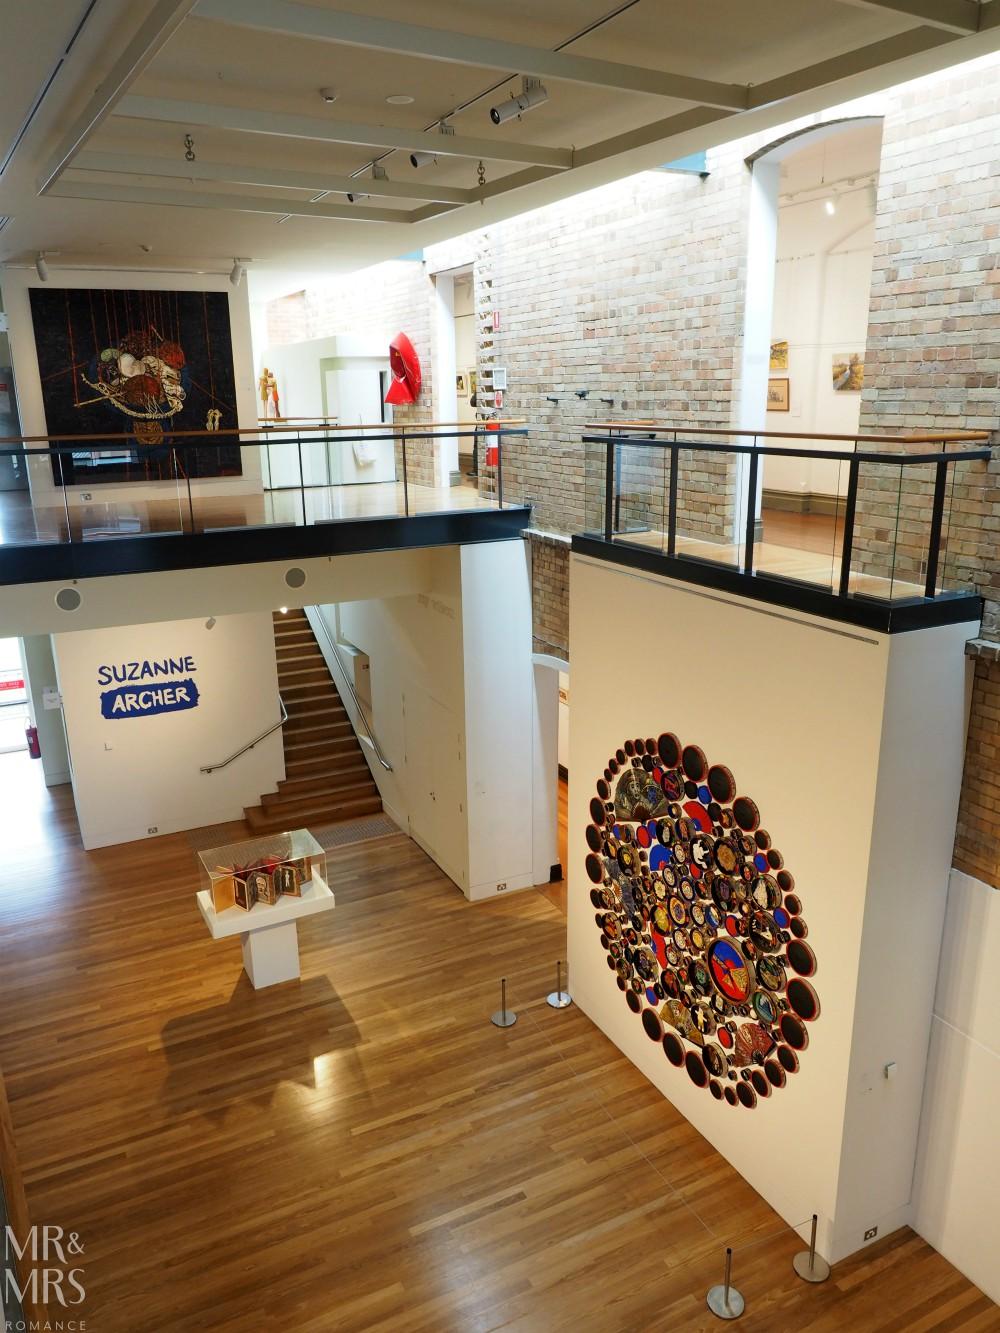 Weekend escape Maitland - MRAG Maitland Regional Art Gallery